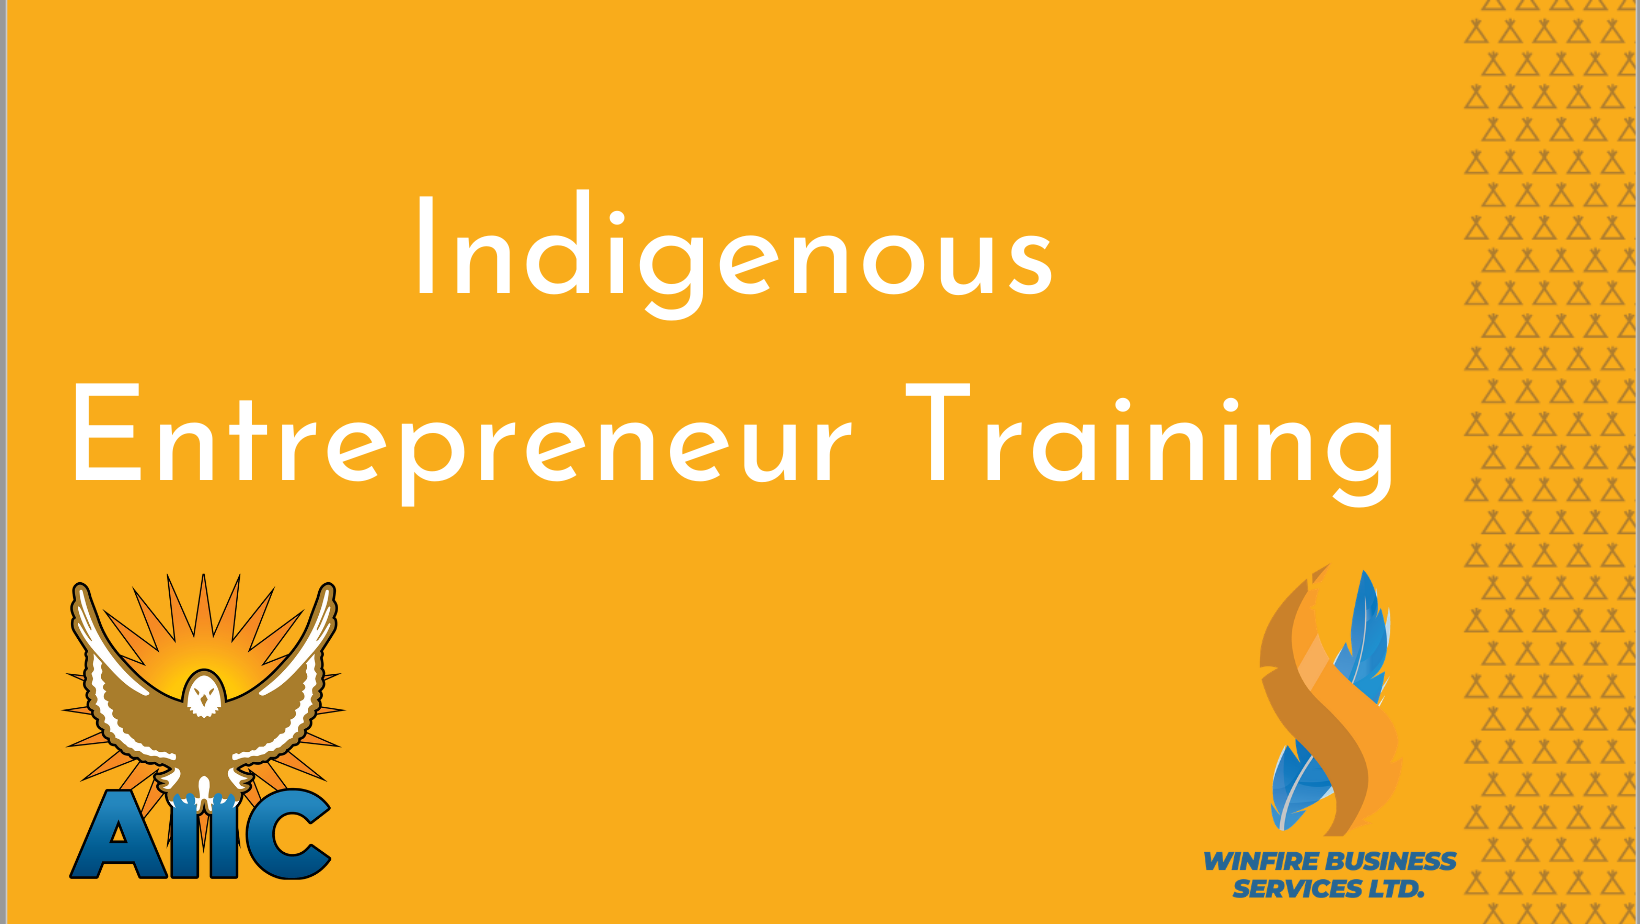 Indigenous Entrepreneur Training